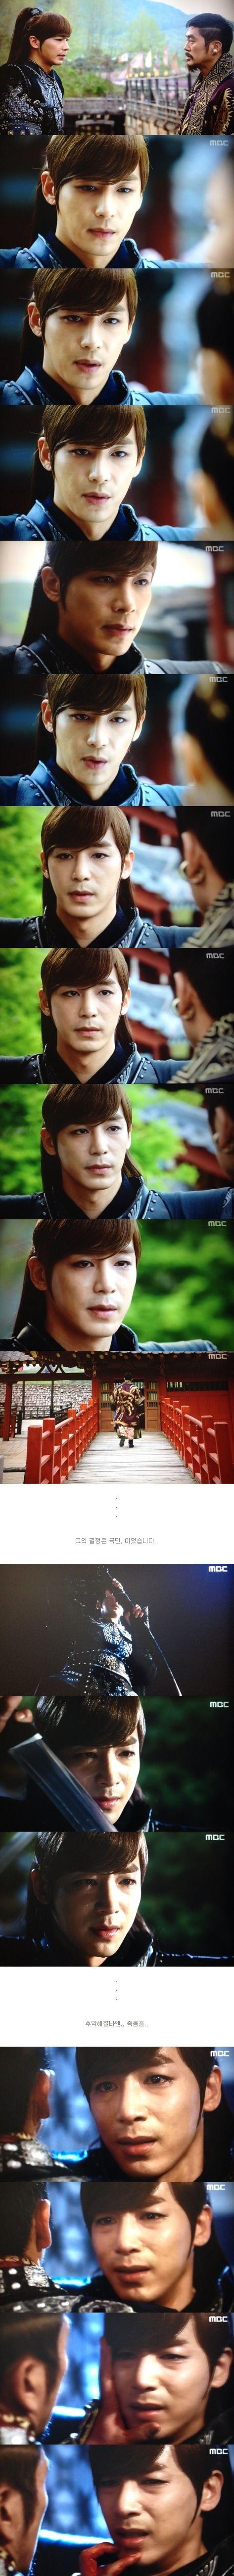 Empress Qi (기황후) Korean - Drama - Episode 48 - Picture @ HanCinema :: The Korean Movie and Drama Database